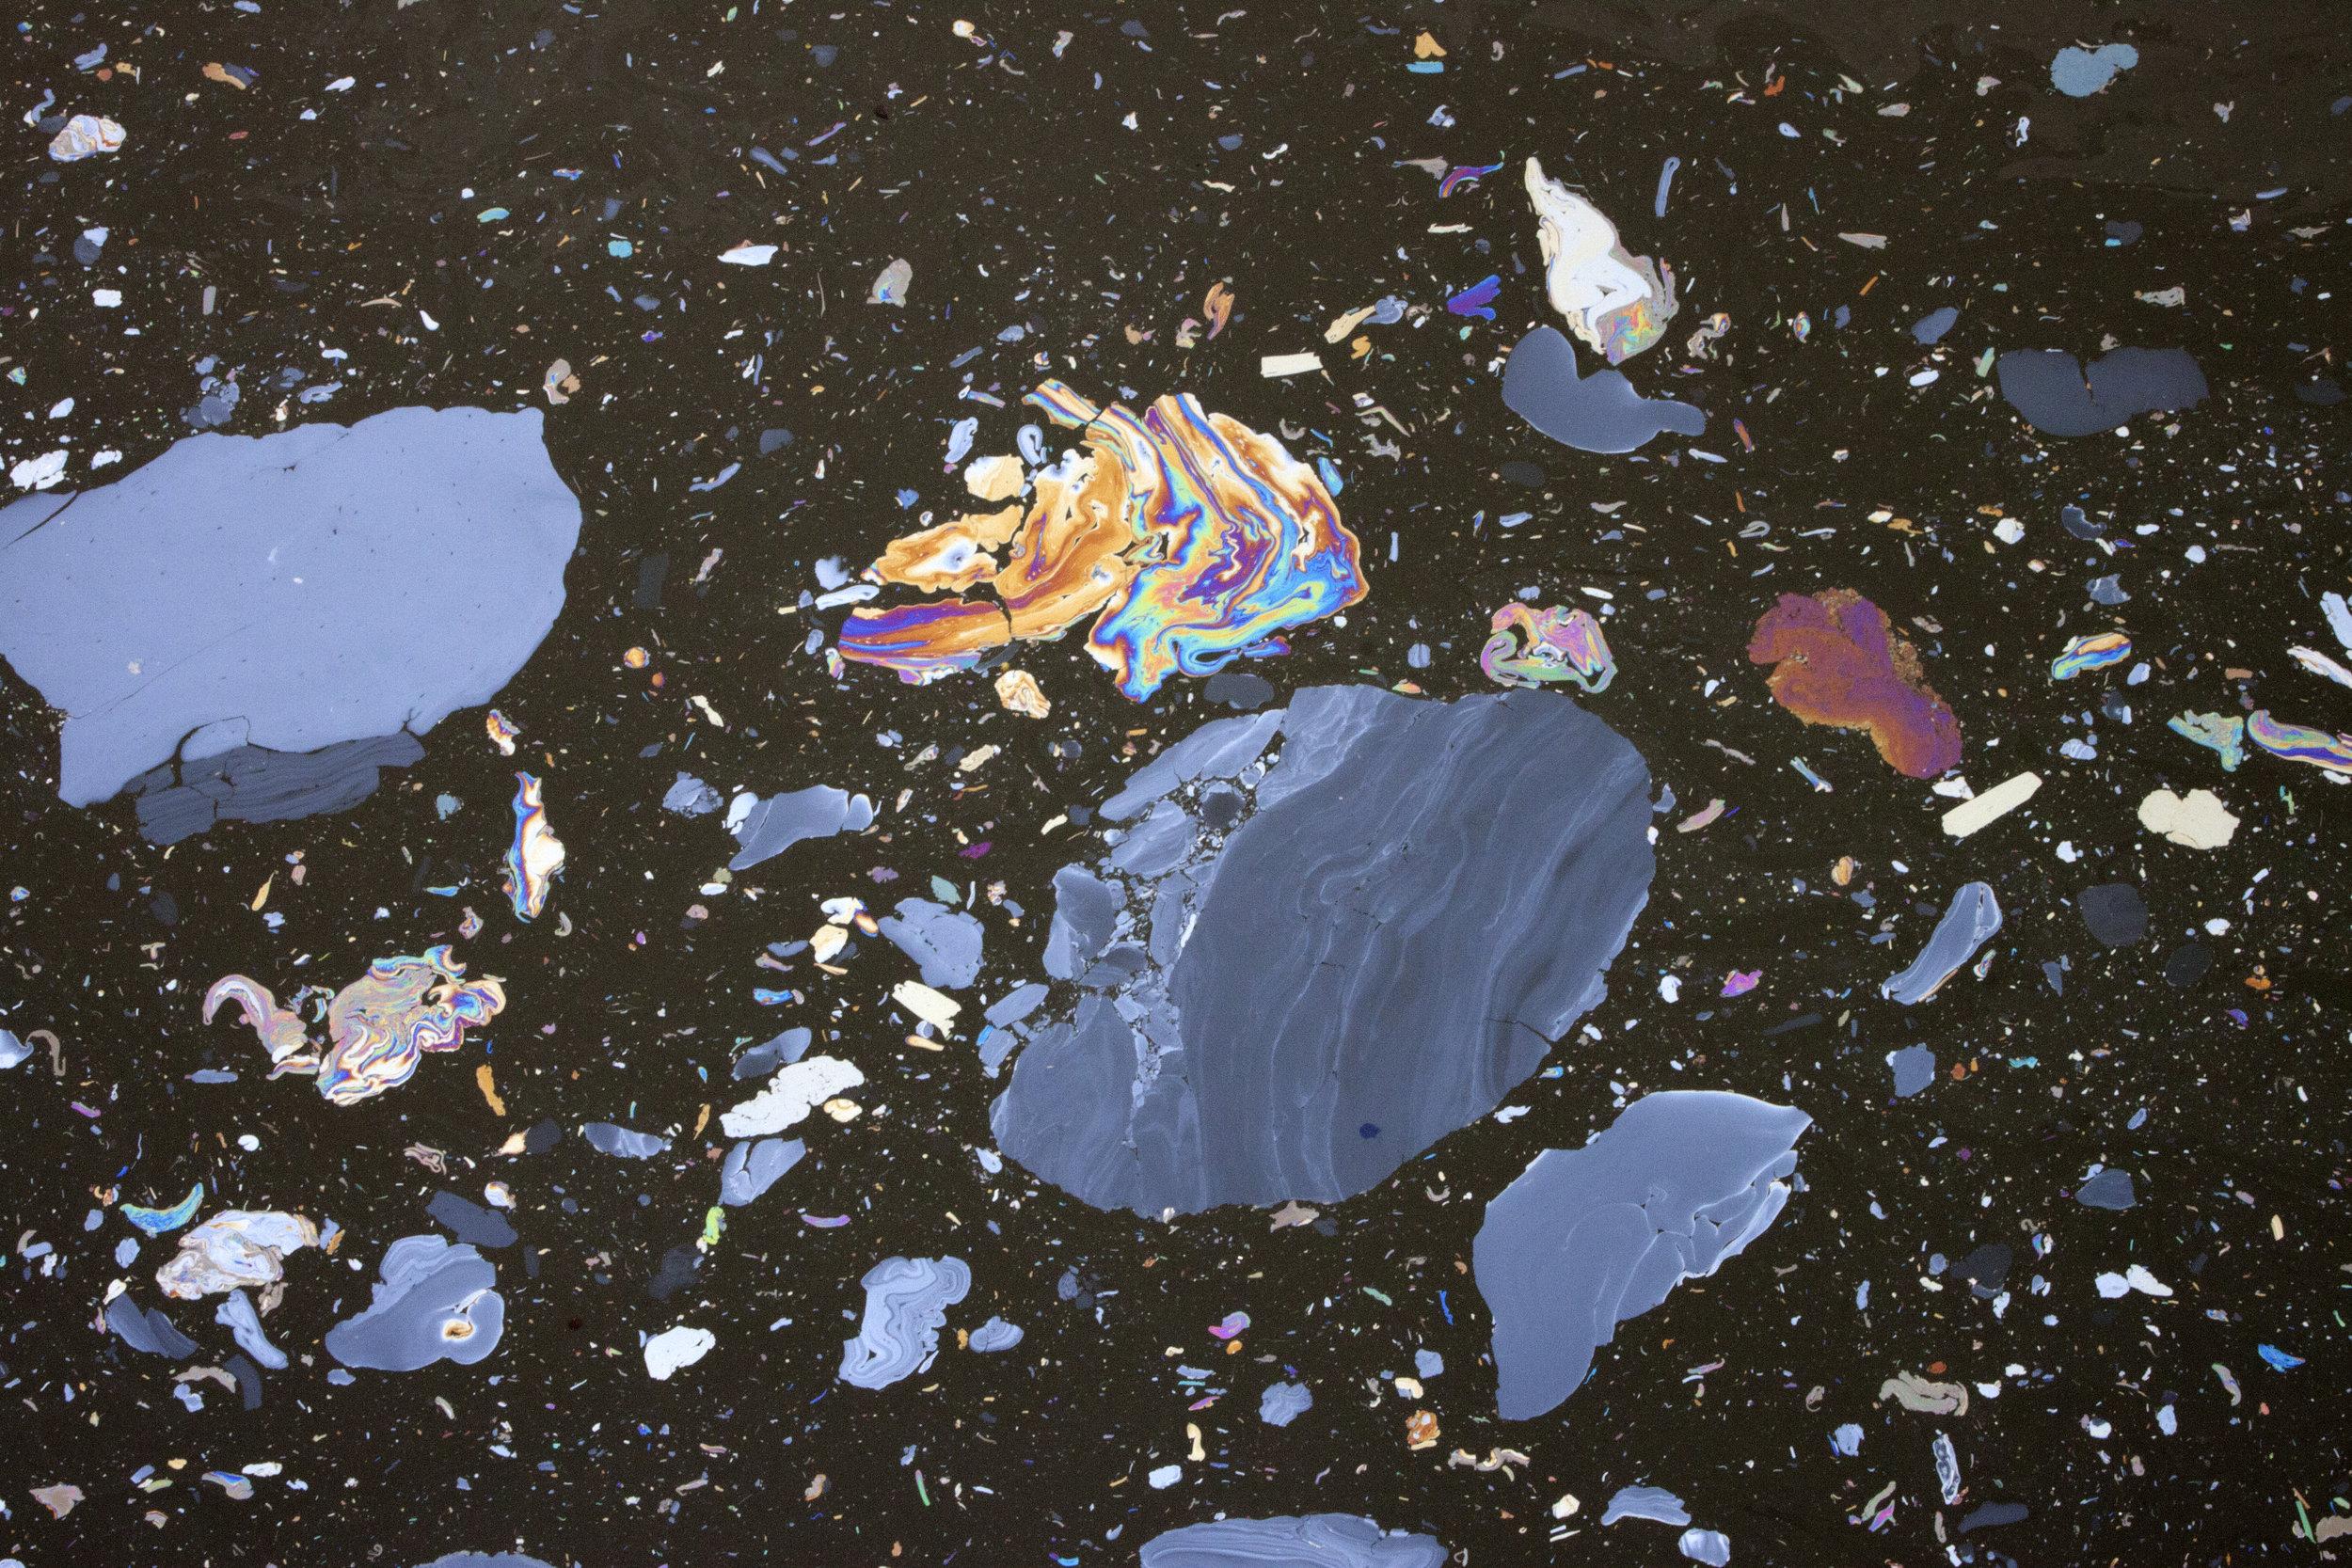 """Celestial Gowanus, #7"" 13x19"" Archival Pigmetn Print, 2016"